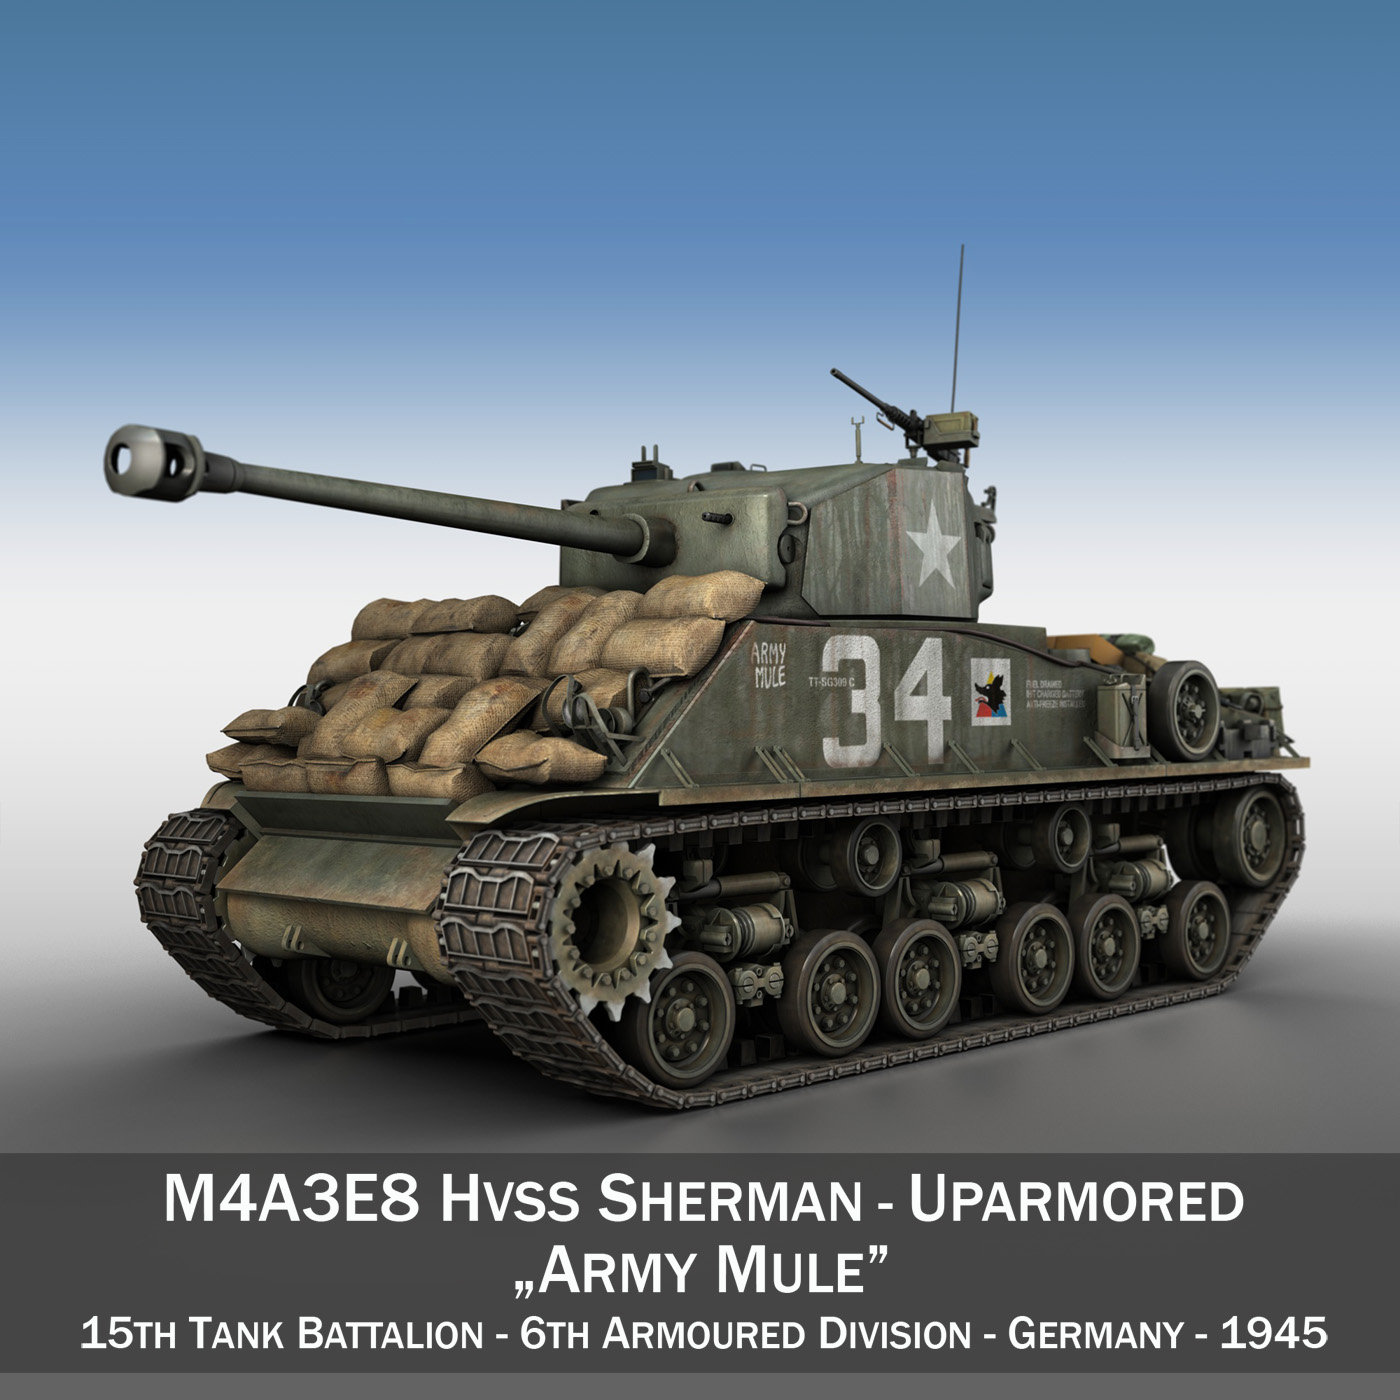 M4A3E8 HVSS Sherman - Army Mule 3d model 3ds fbx c4d lwo lws lw obj 292643